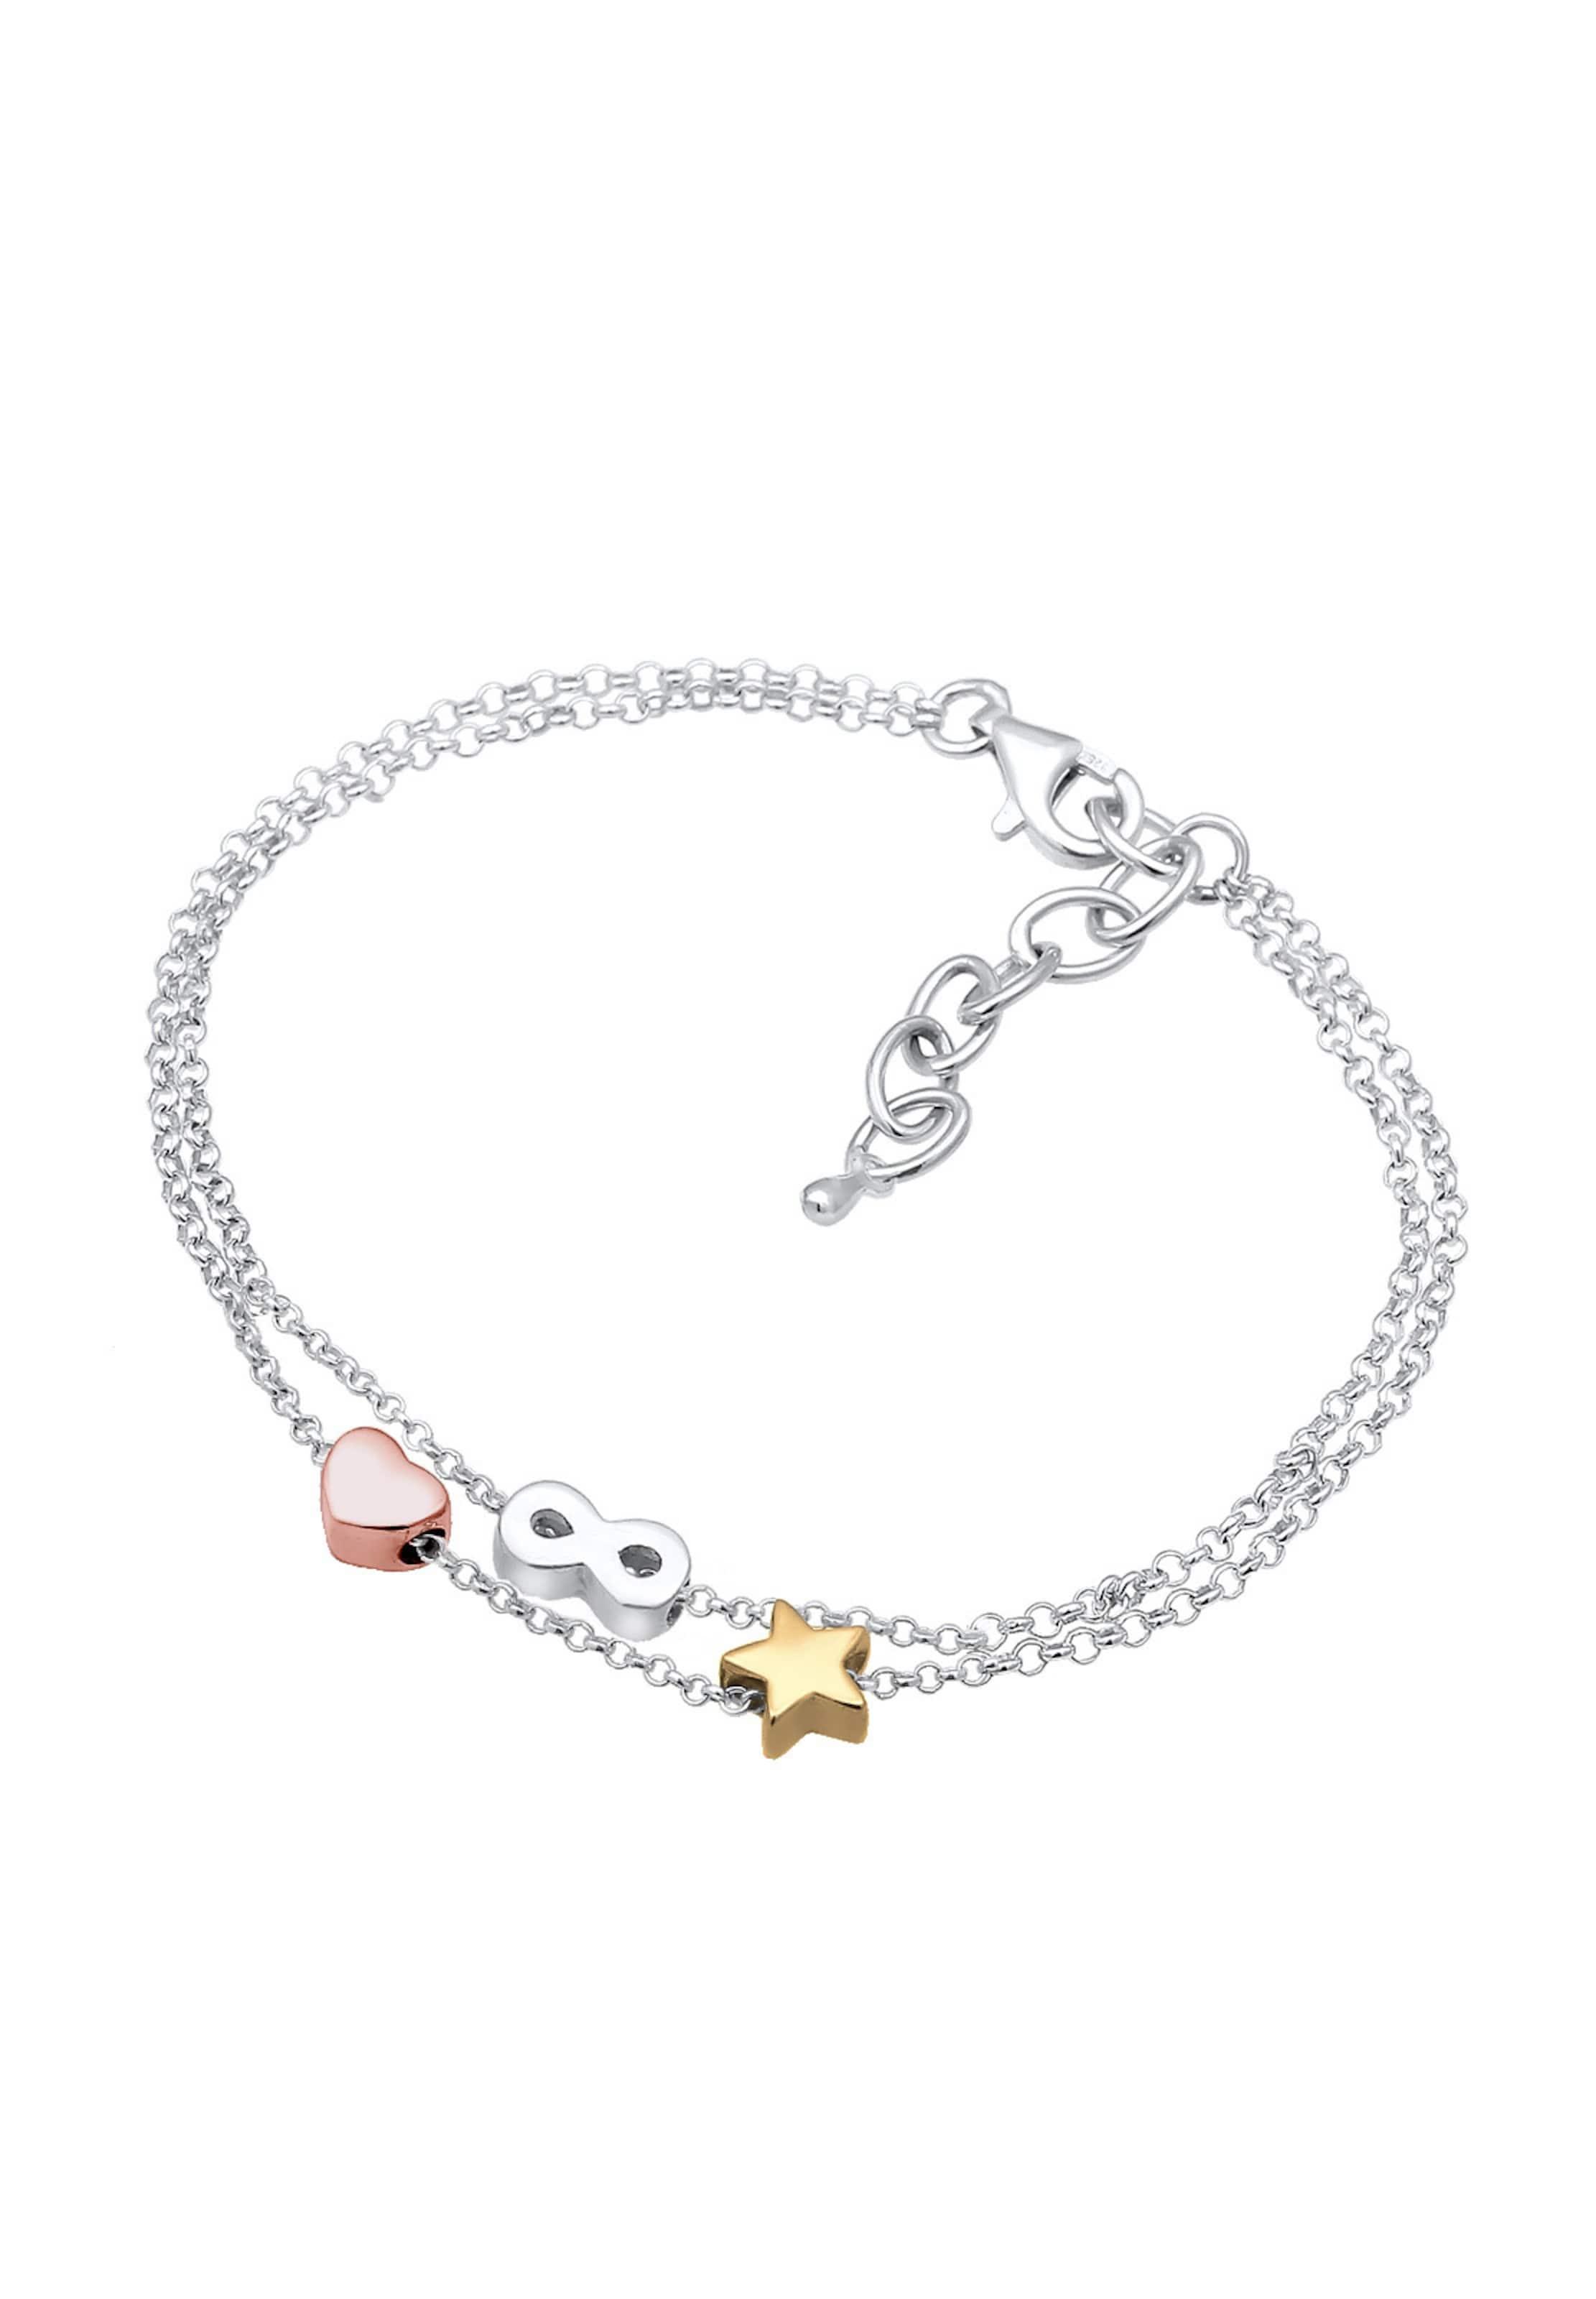 Silber In Armband Armband Elli GoldRosegold Elli GoldRosegold In EDHb2e9YWI